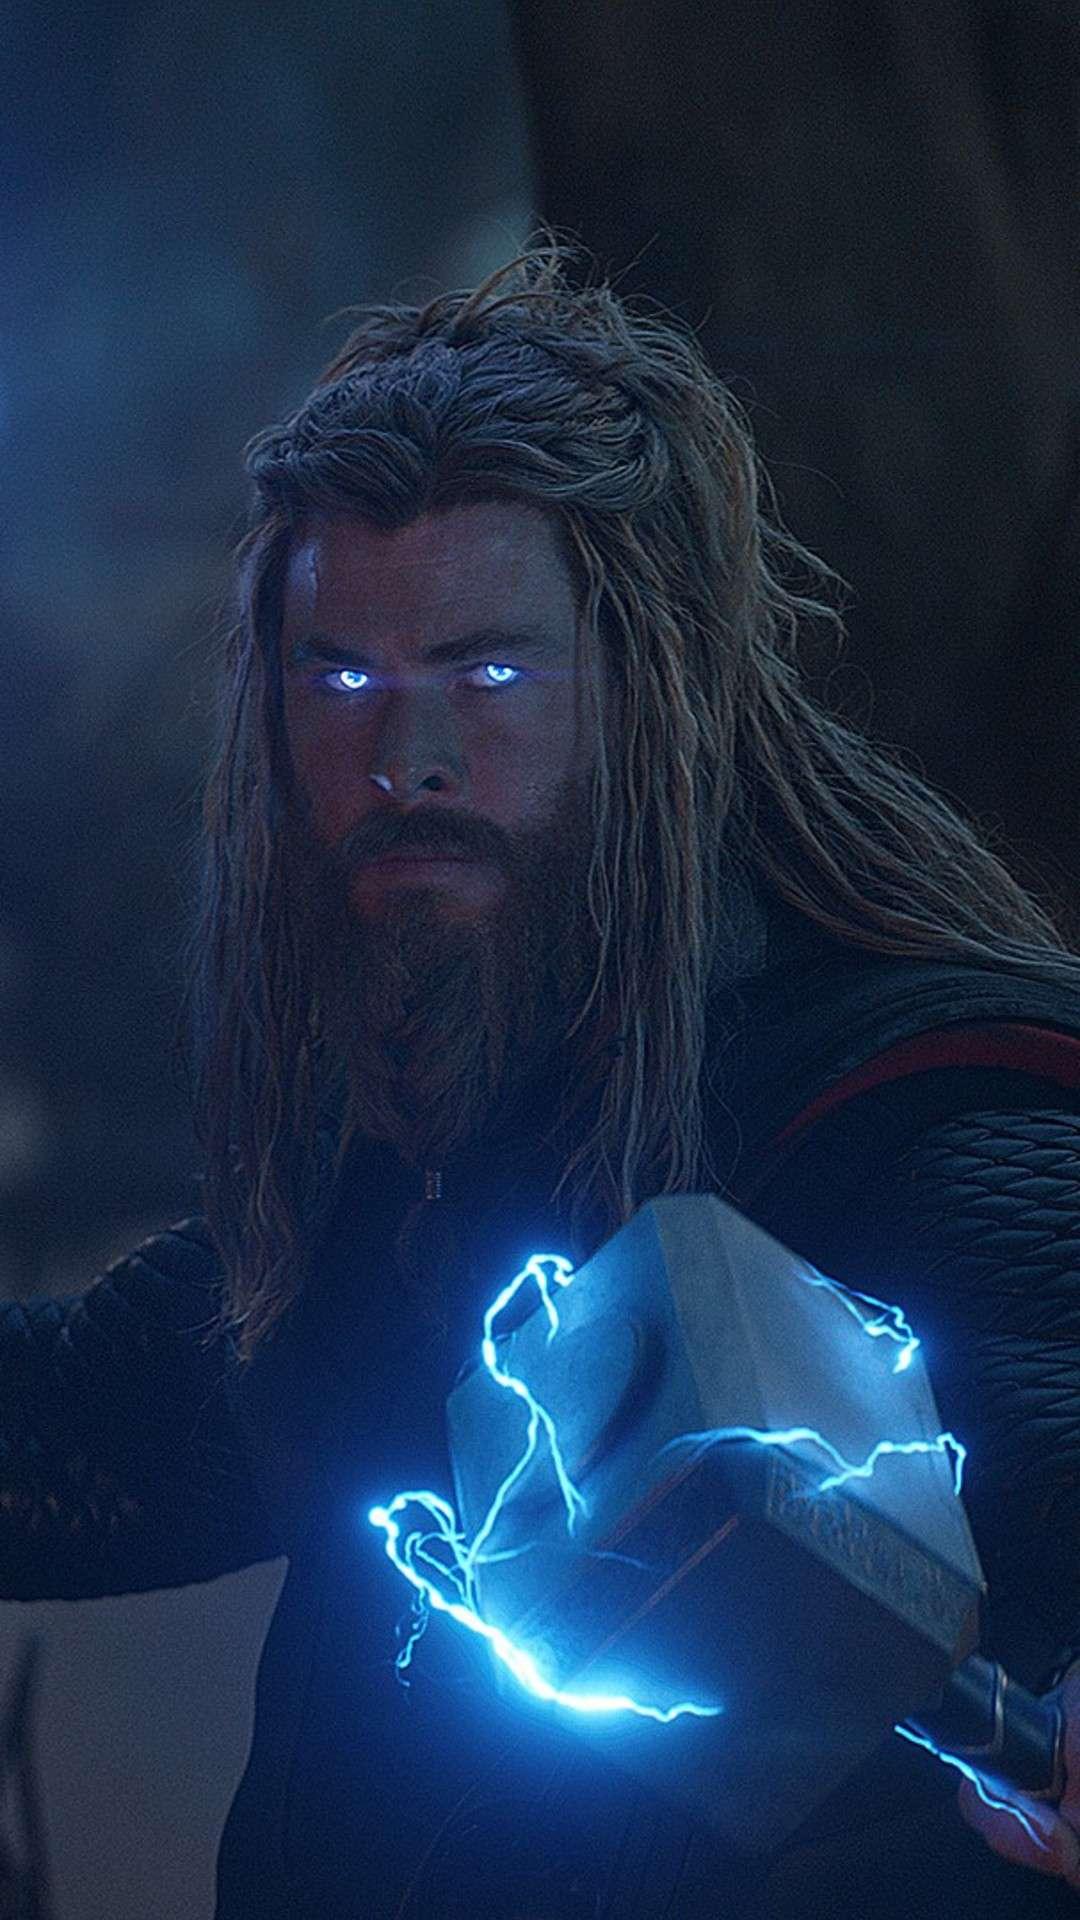 Thor Avengers Endgame Final Battle iPhone Wallpaper